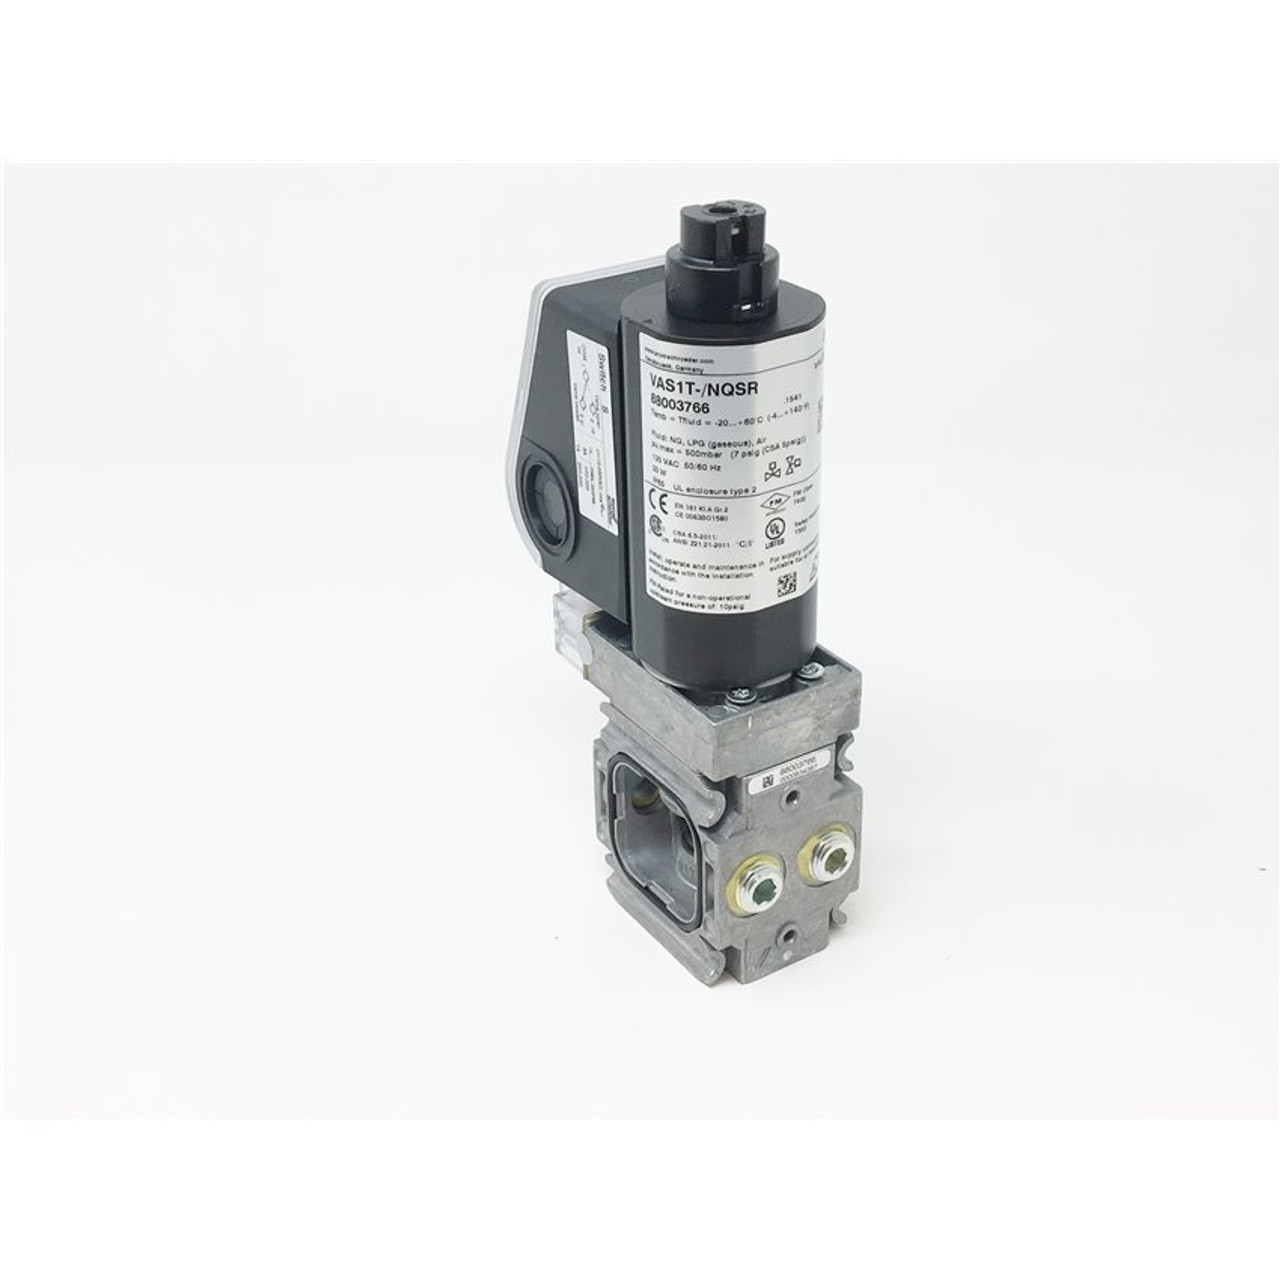 KROMSCHRODER VAS1T-/NQSR GAS SOLENOID VALVE - KS88003766